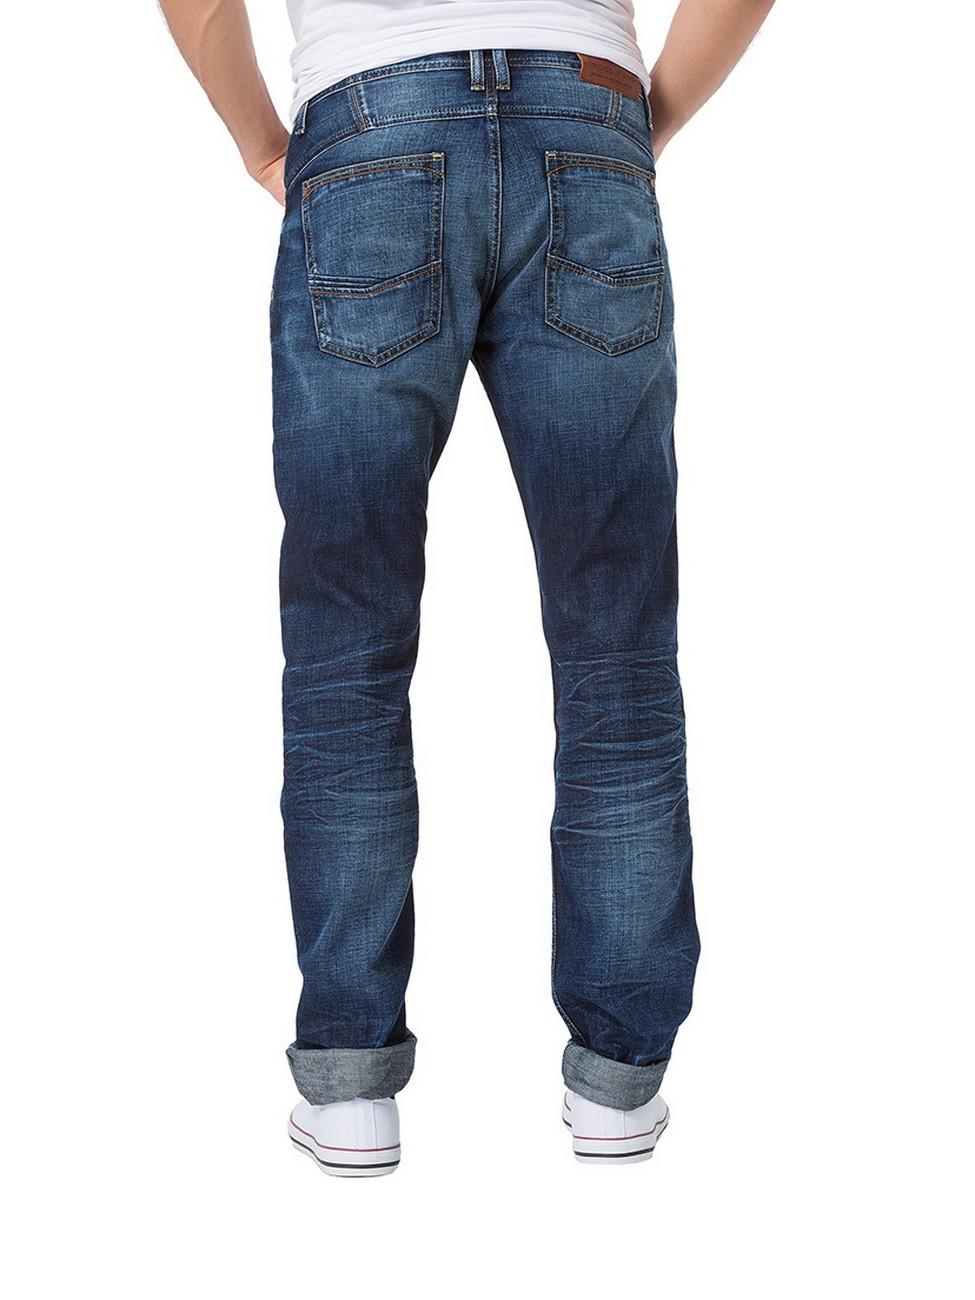 cross herren jeans antonio relax fit blau extreme. Black Bedroom Furniture Sets. Home Design Ideas